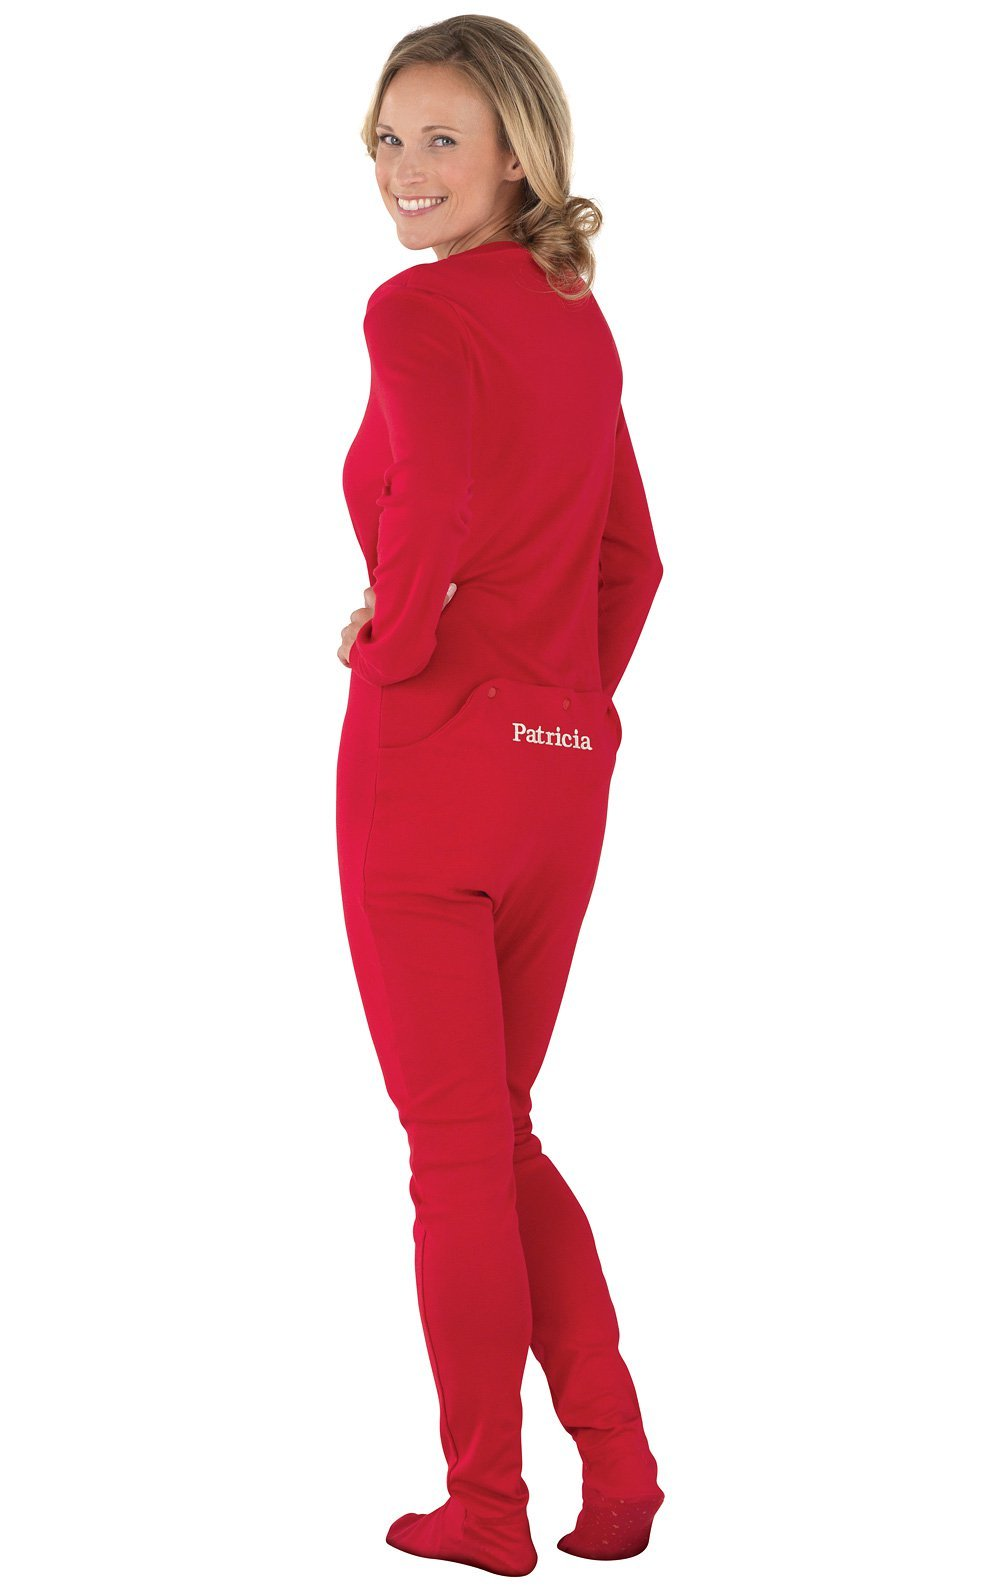 PajamaGram Personalized Women's Cotton Dropseat Footie Pajamas, Red, Sml (4-6)